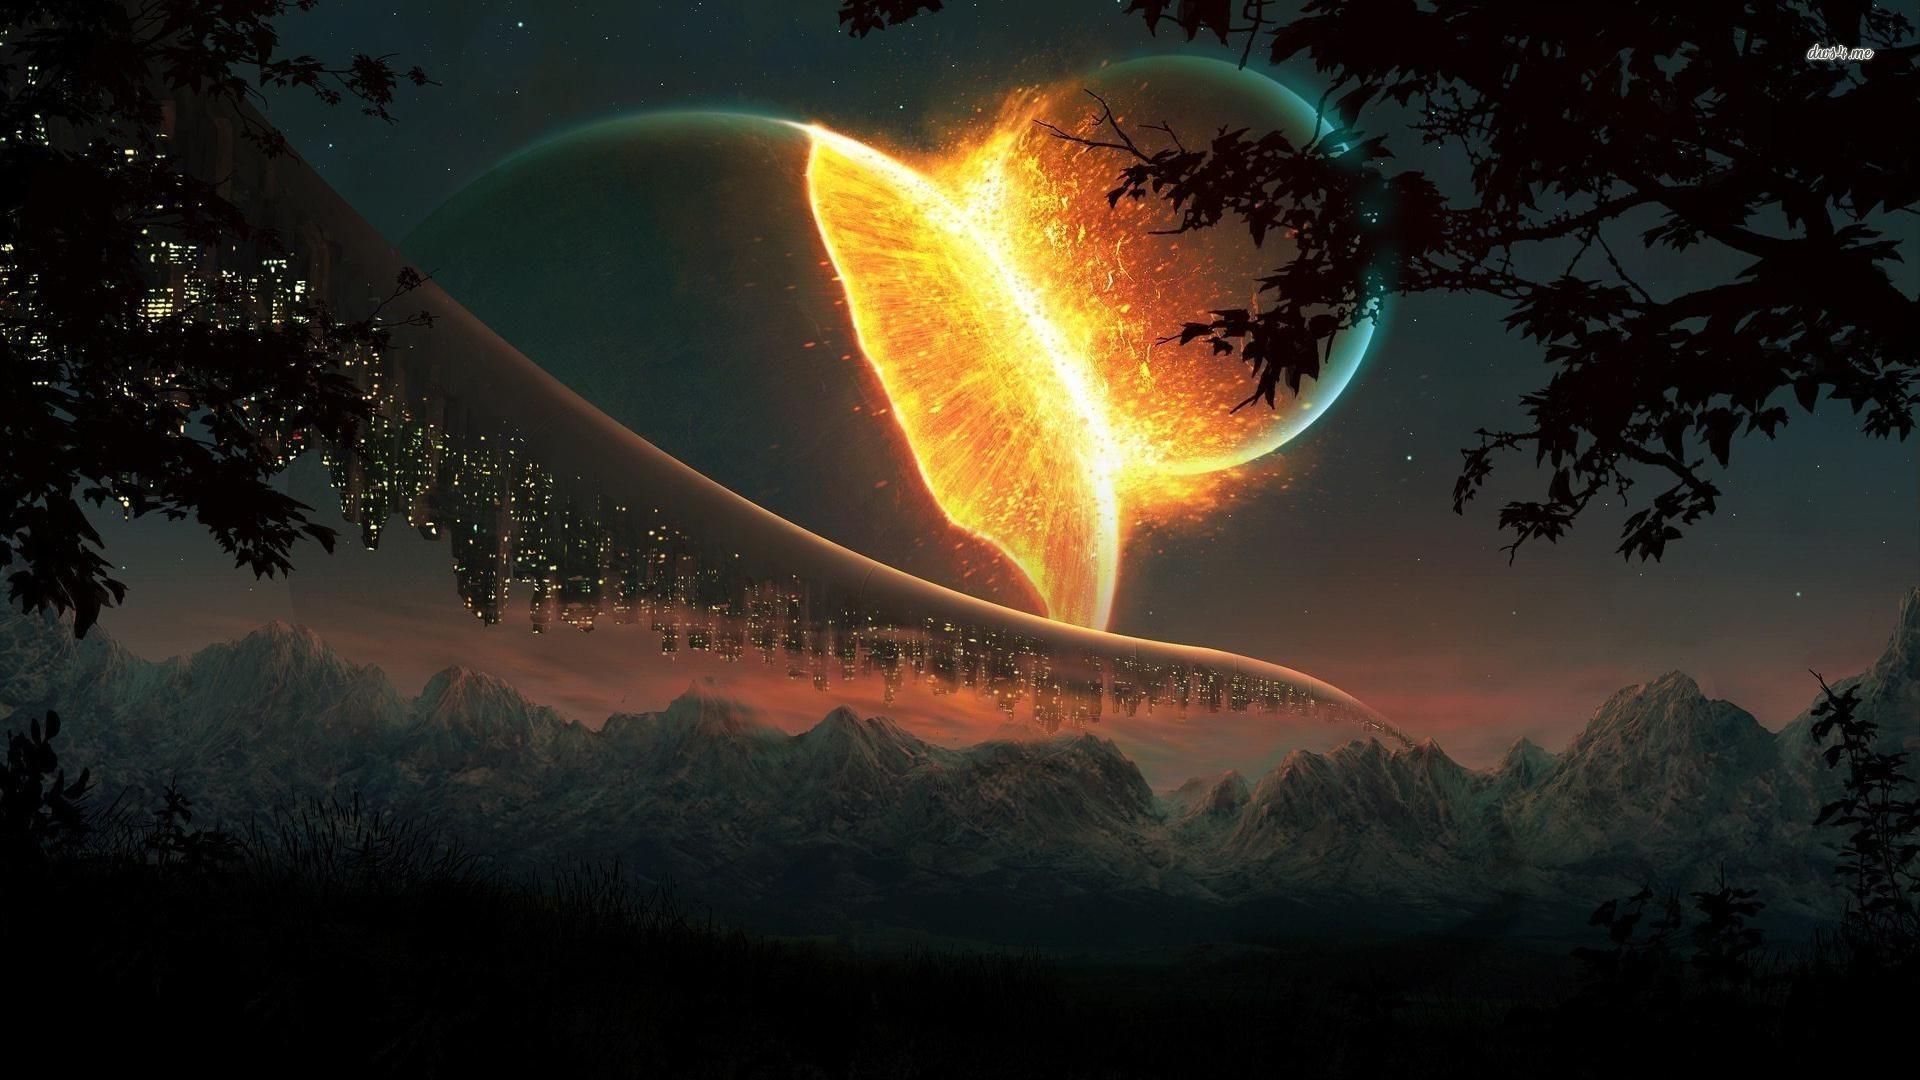 Name: 20851-colliding-planets-1920×1080-fantasy-wallpaper.jpg Views